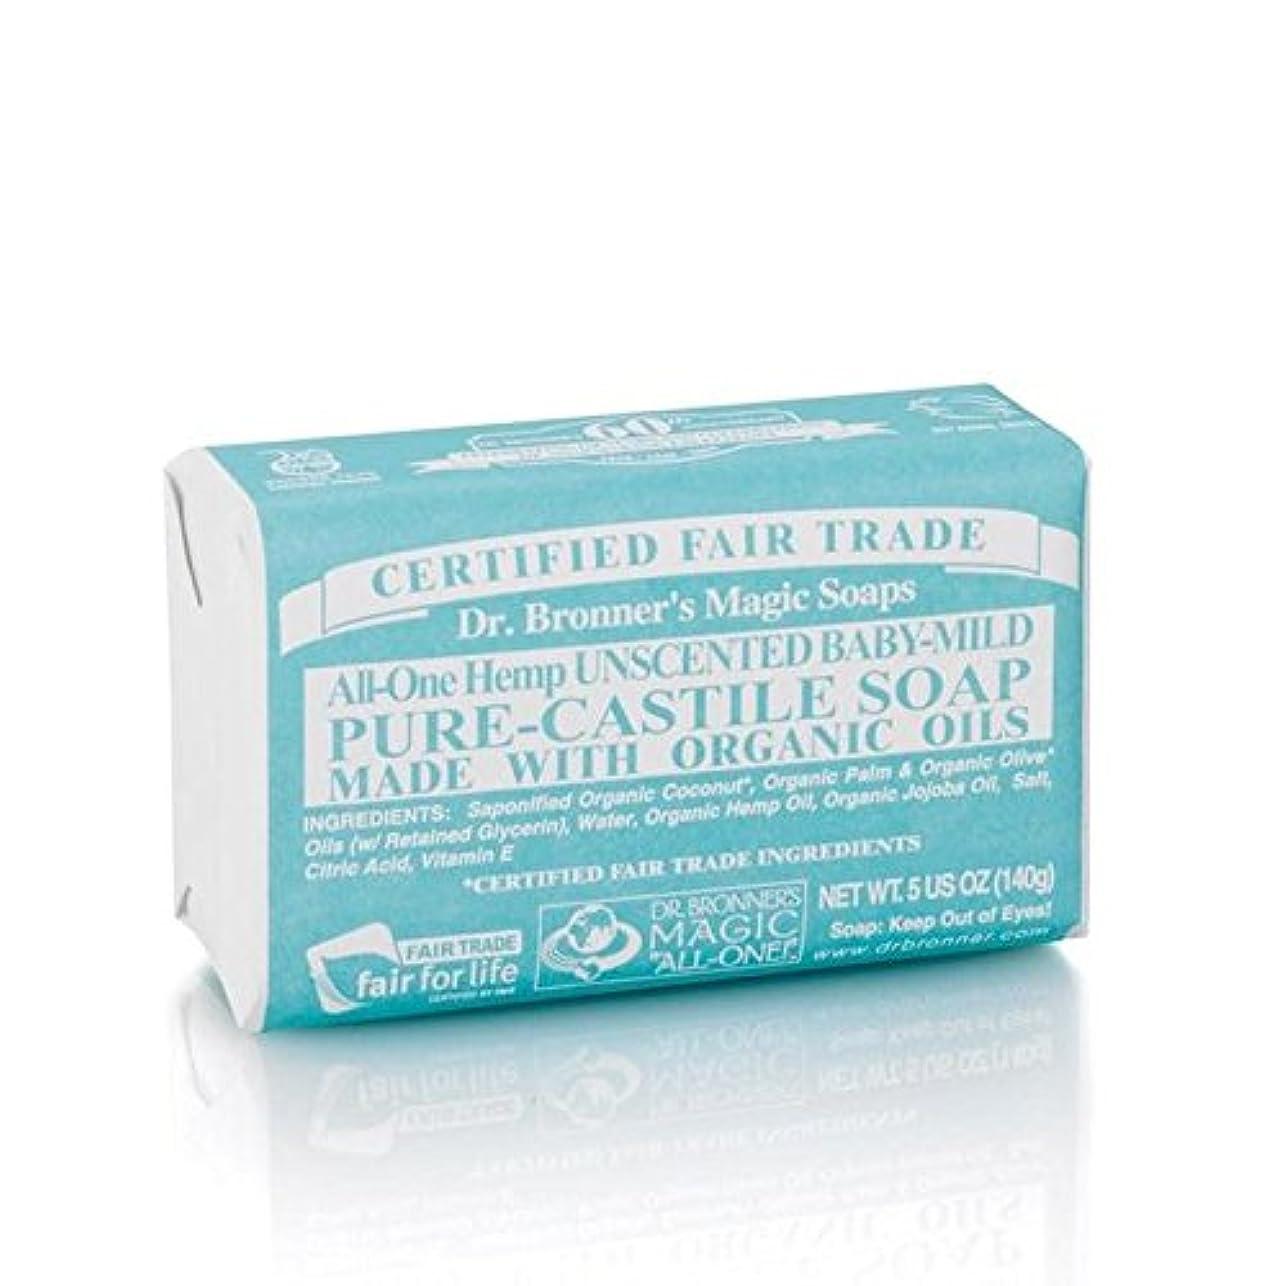 Dr Bronner Organic Baby Mild Soap Bar 140g - のブロナーオーガニックベビーマイルドソープバー140グラム [並行輸入品]